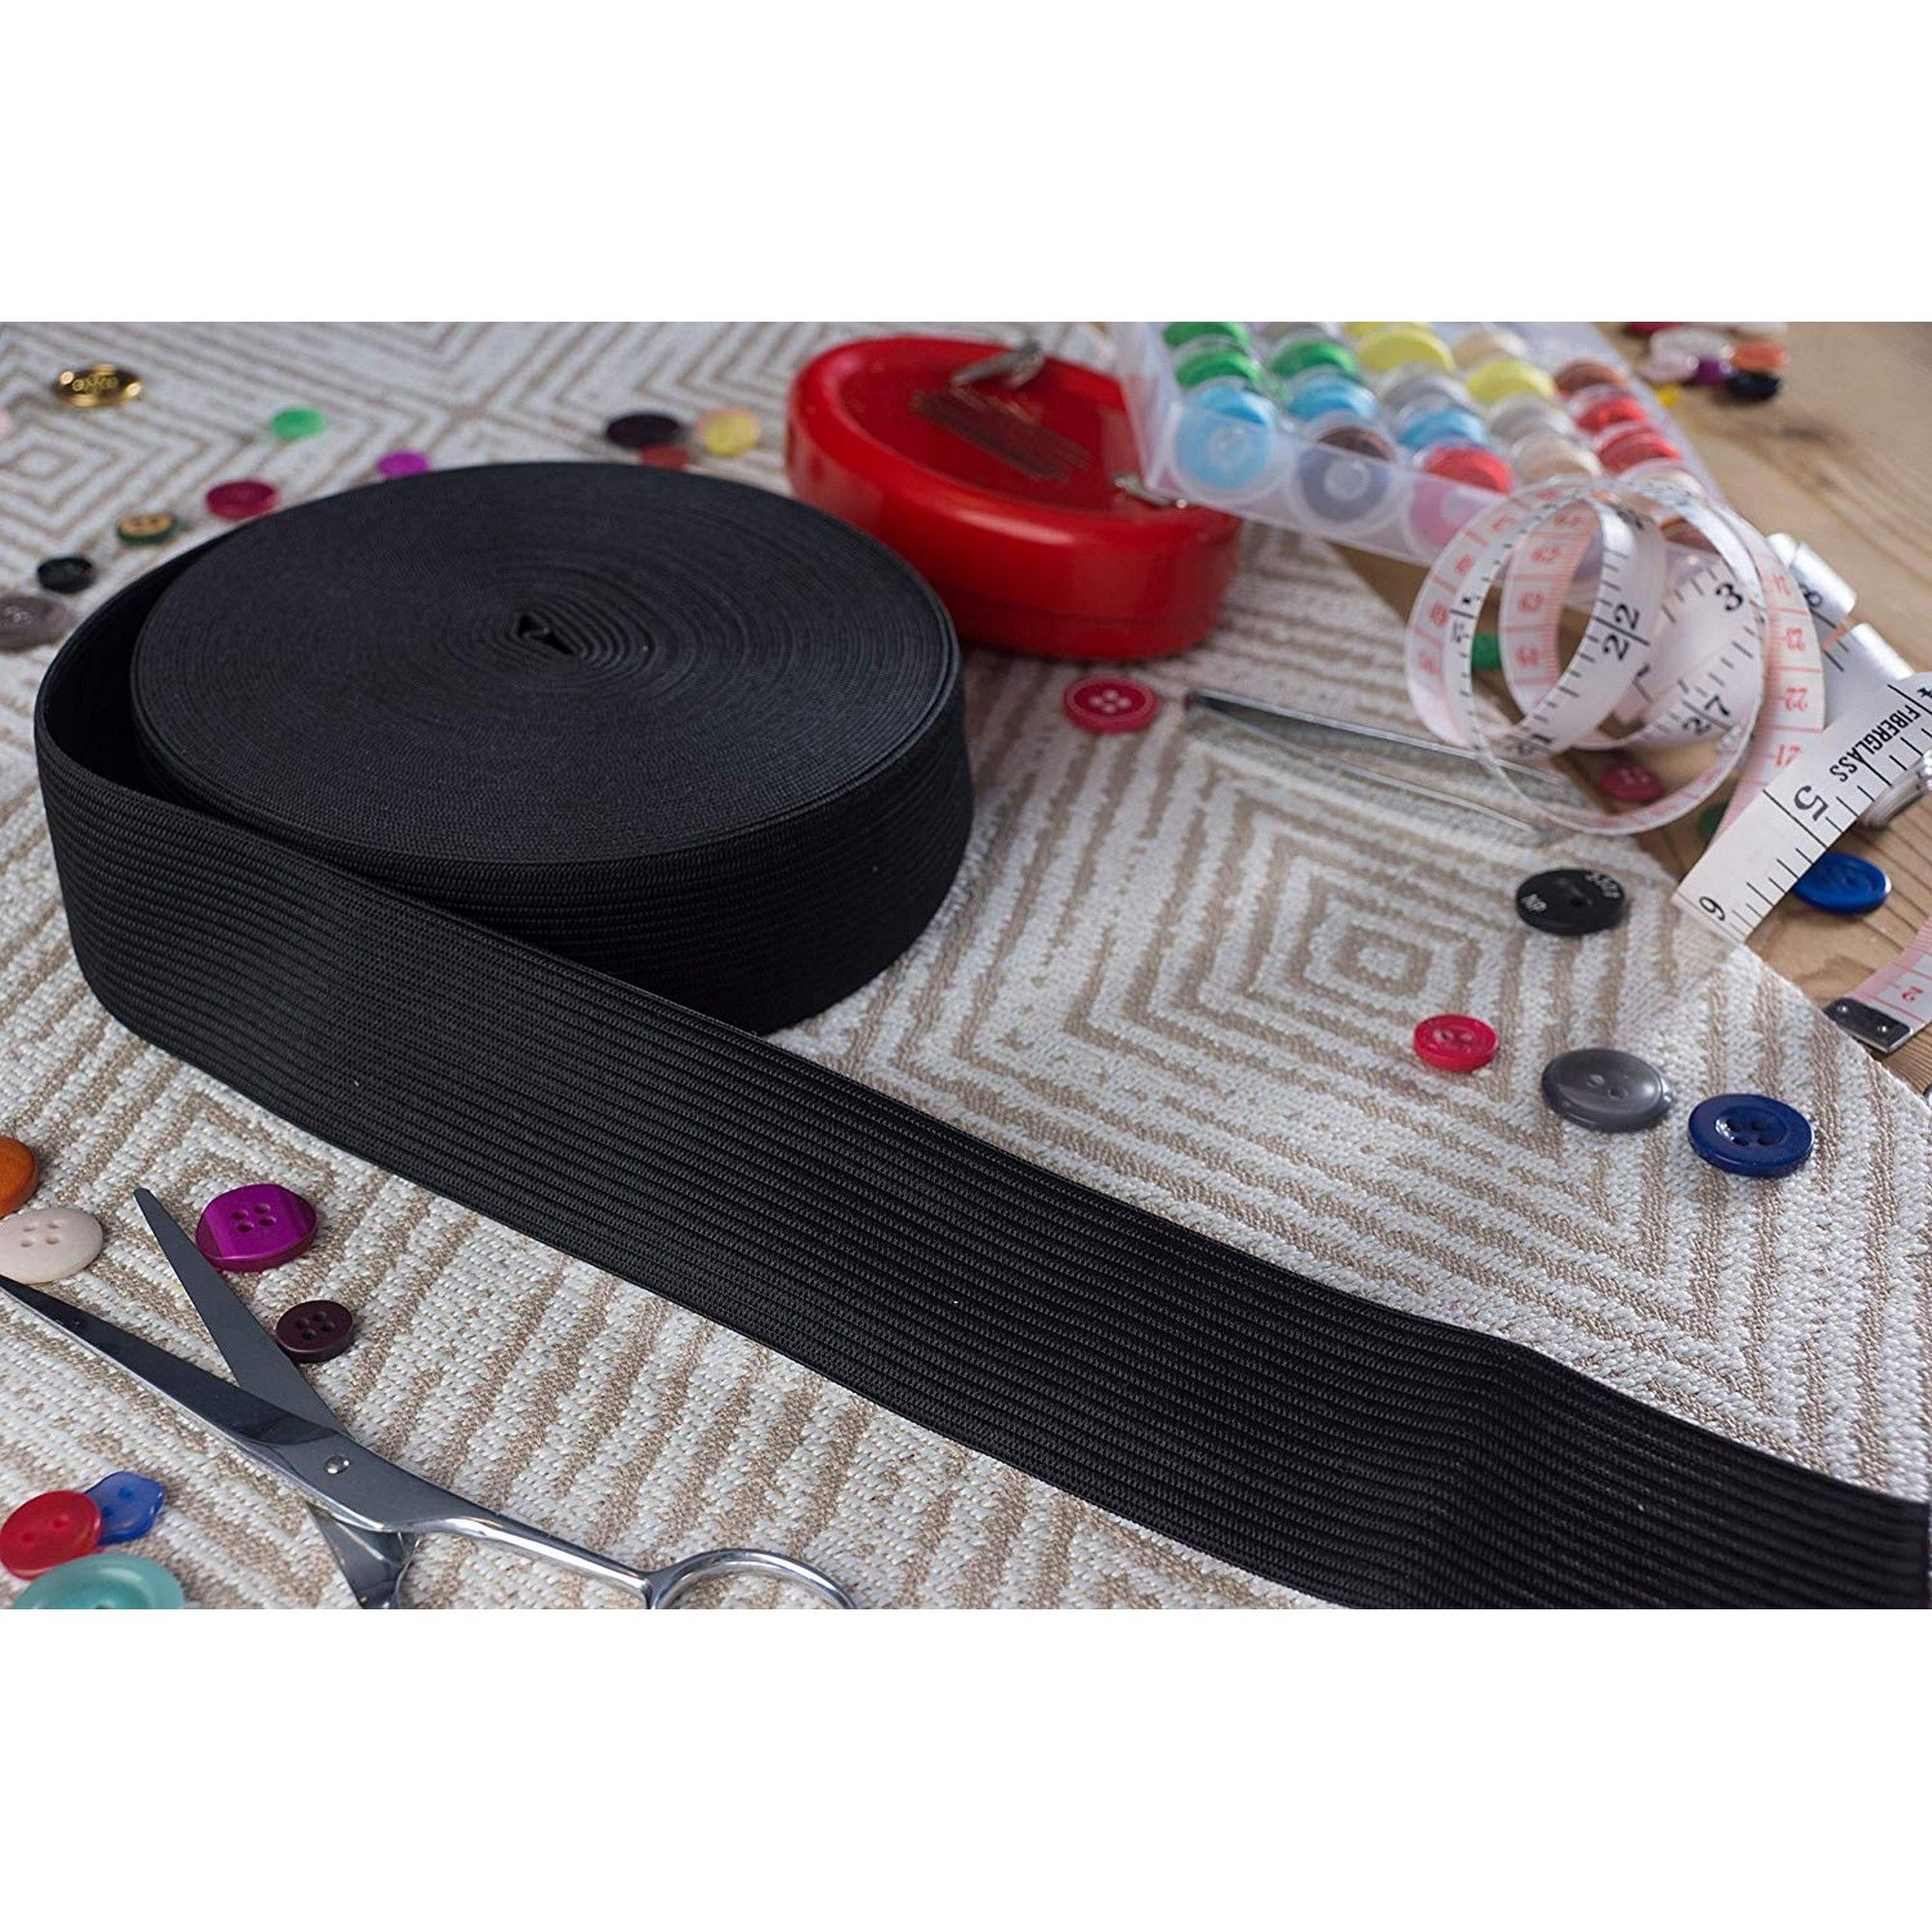 elastic waistband dressmaking elastic sewing supplies 1 Elastic 5m black Black dress elastic UK haberdashery black elastic waistband